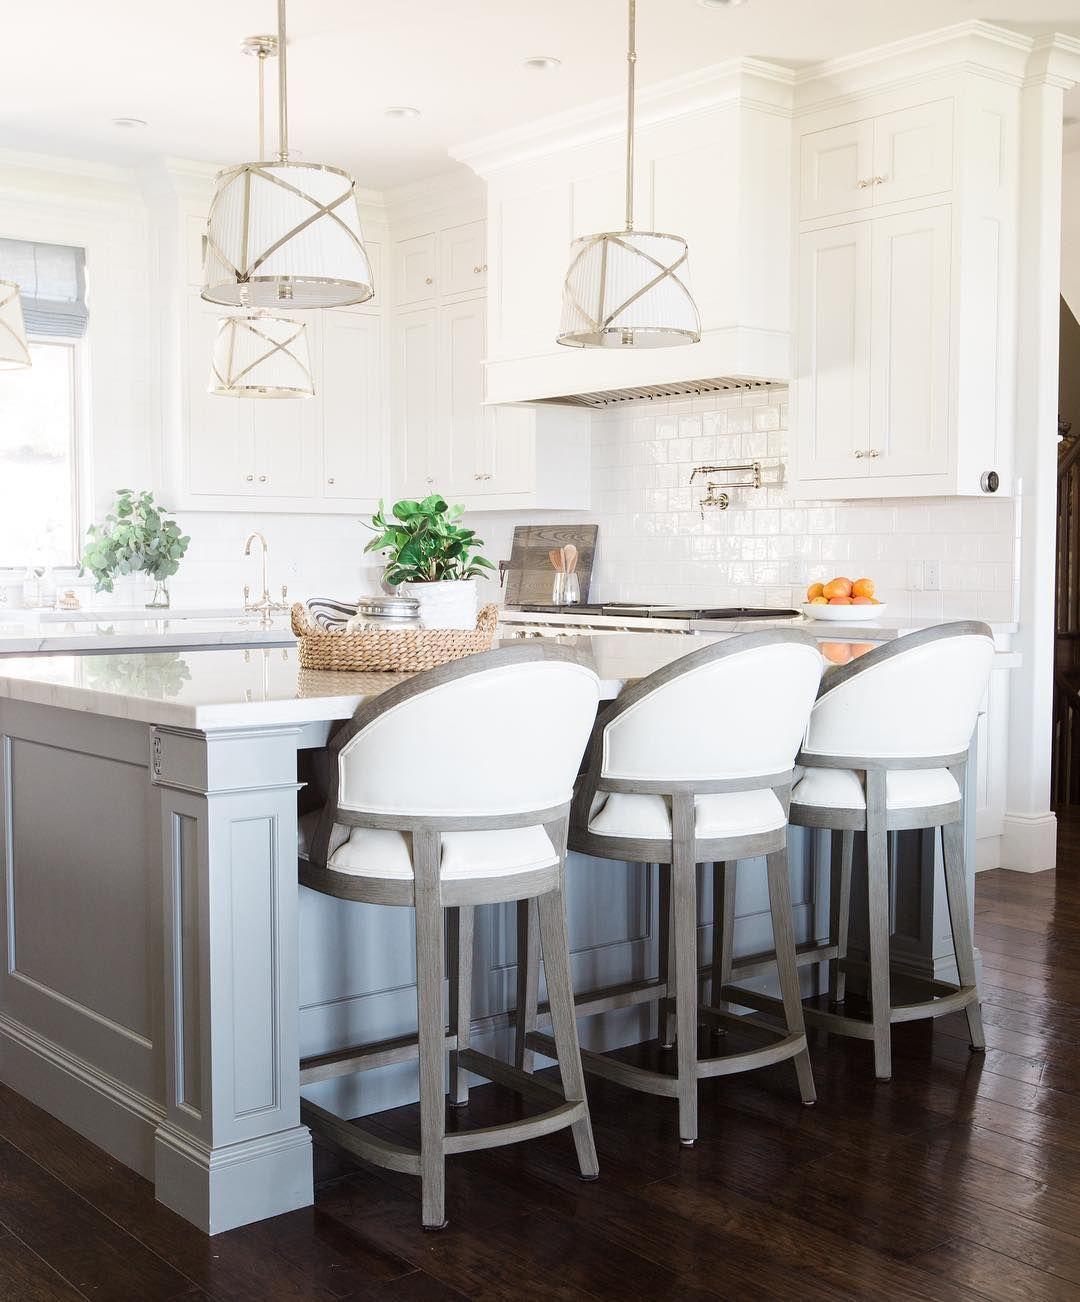 Gray Kitchen Island  Wwwstudiomcgee  Kitchen  Pinterest Cool Kitchen Island Chairs Review